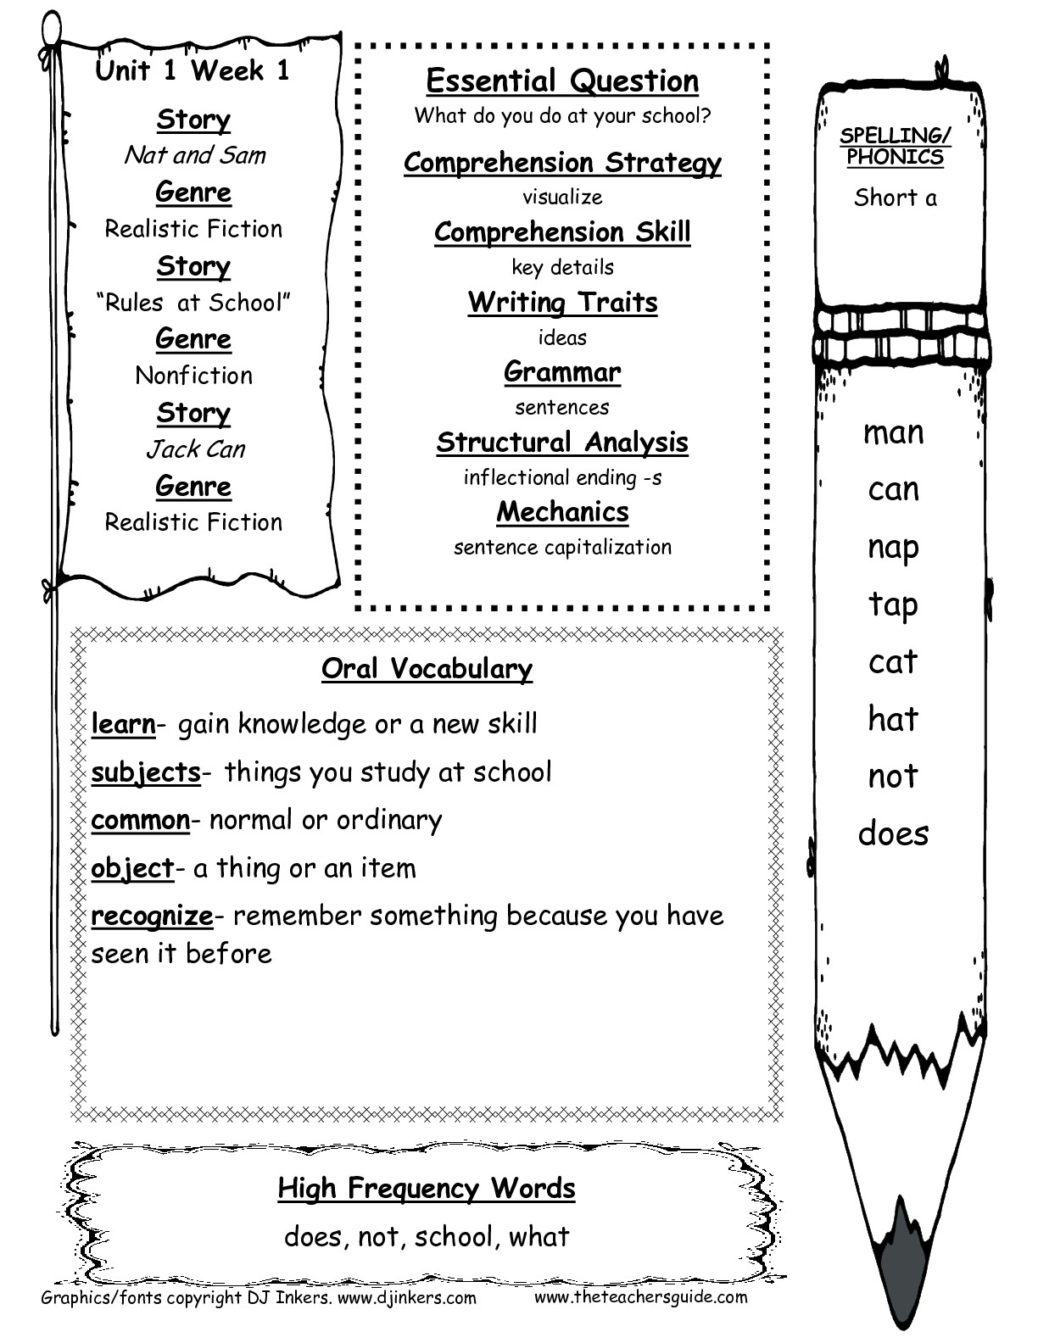 Cursive Writing Worksheets Free Printable Math For Kindergarten And   1St Grade Writing Worksheets Free Printable